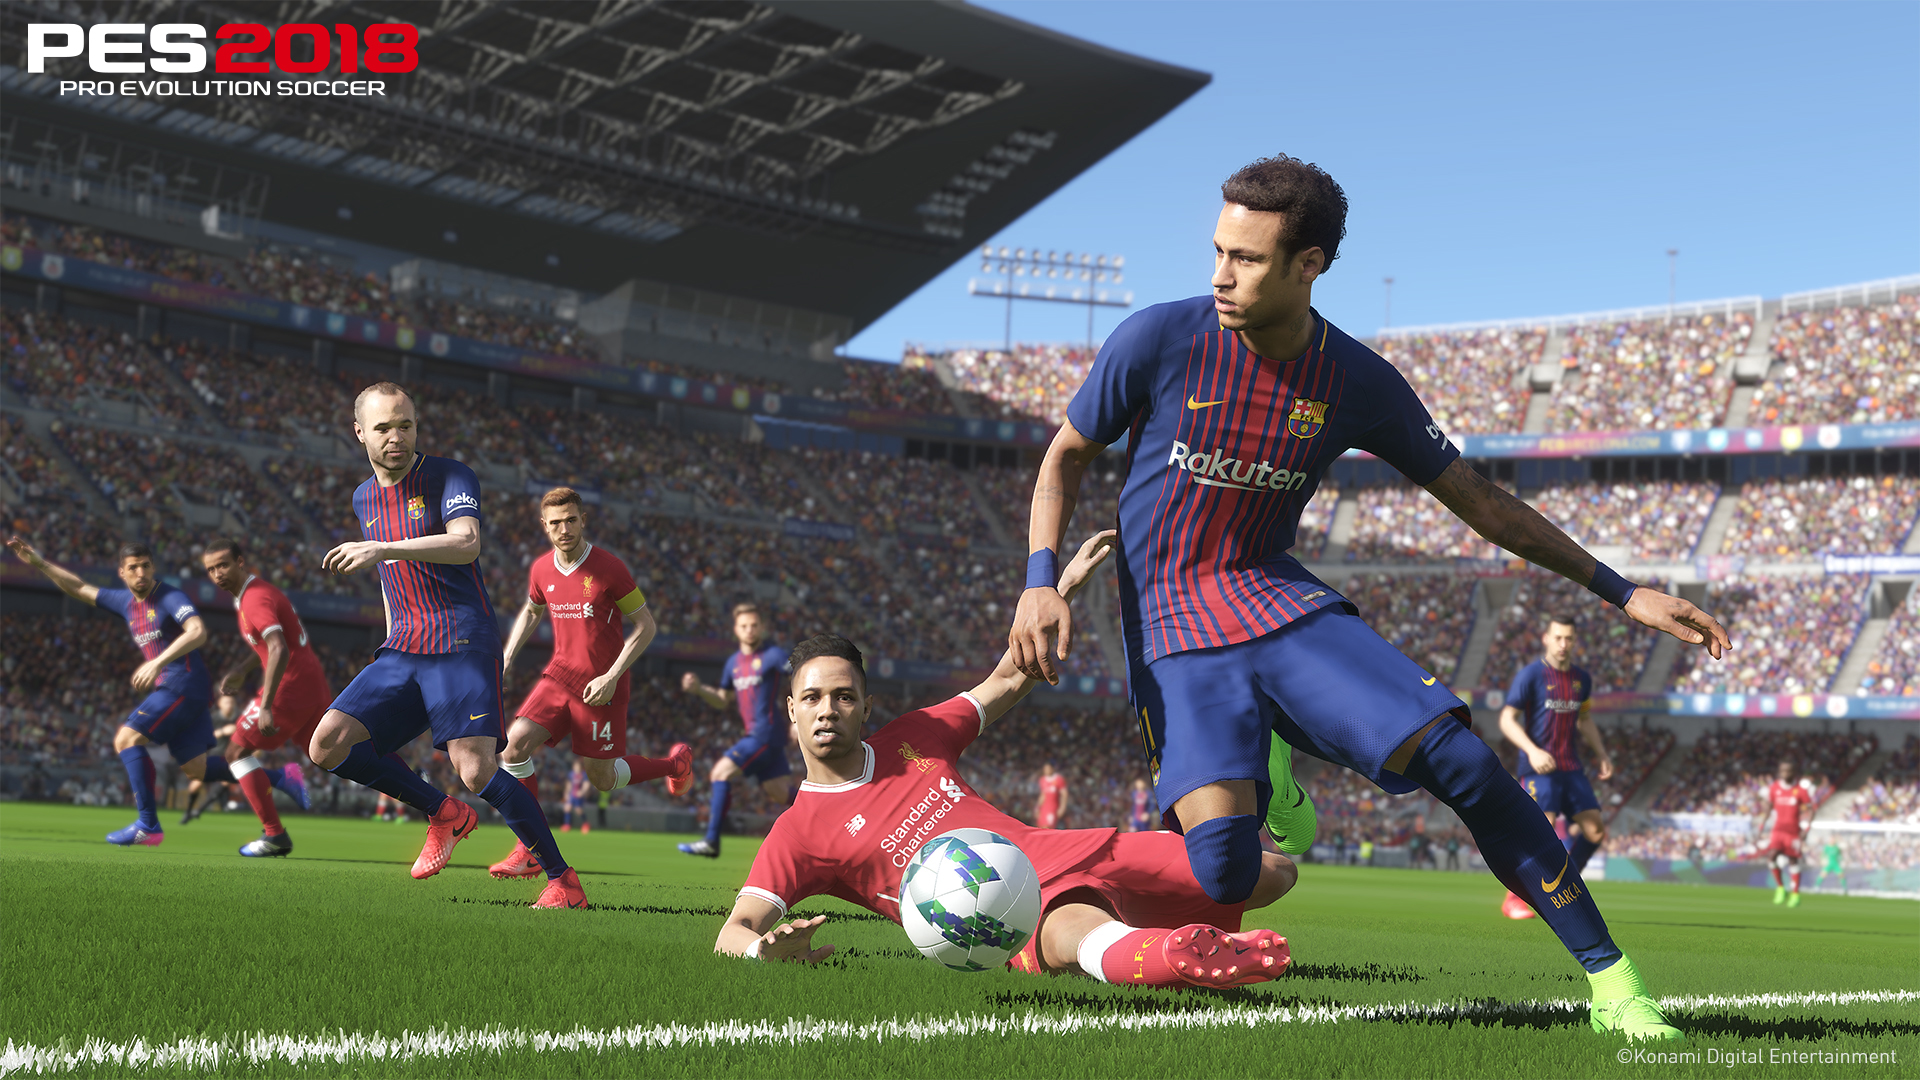 http://images.performgroup.com/di/library/GOAL/6d/e/pro-evolution-soccer-2018_t1uhfwptnghh1jvbzdh8jcxs3.jpg